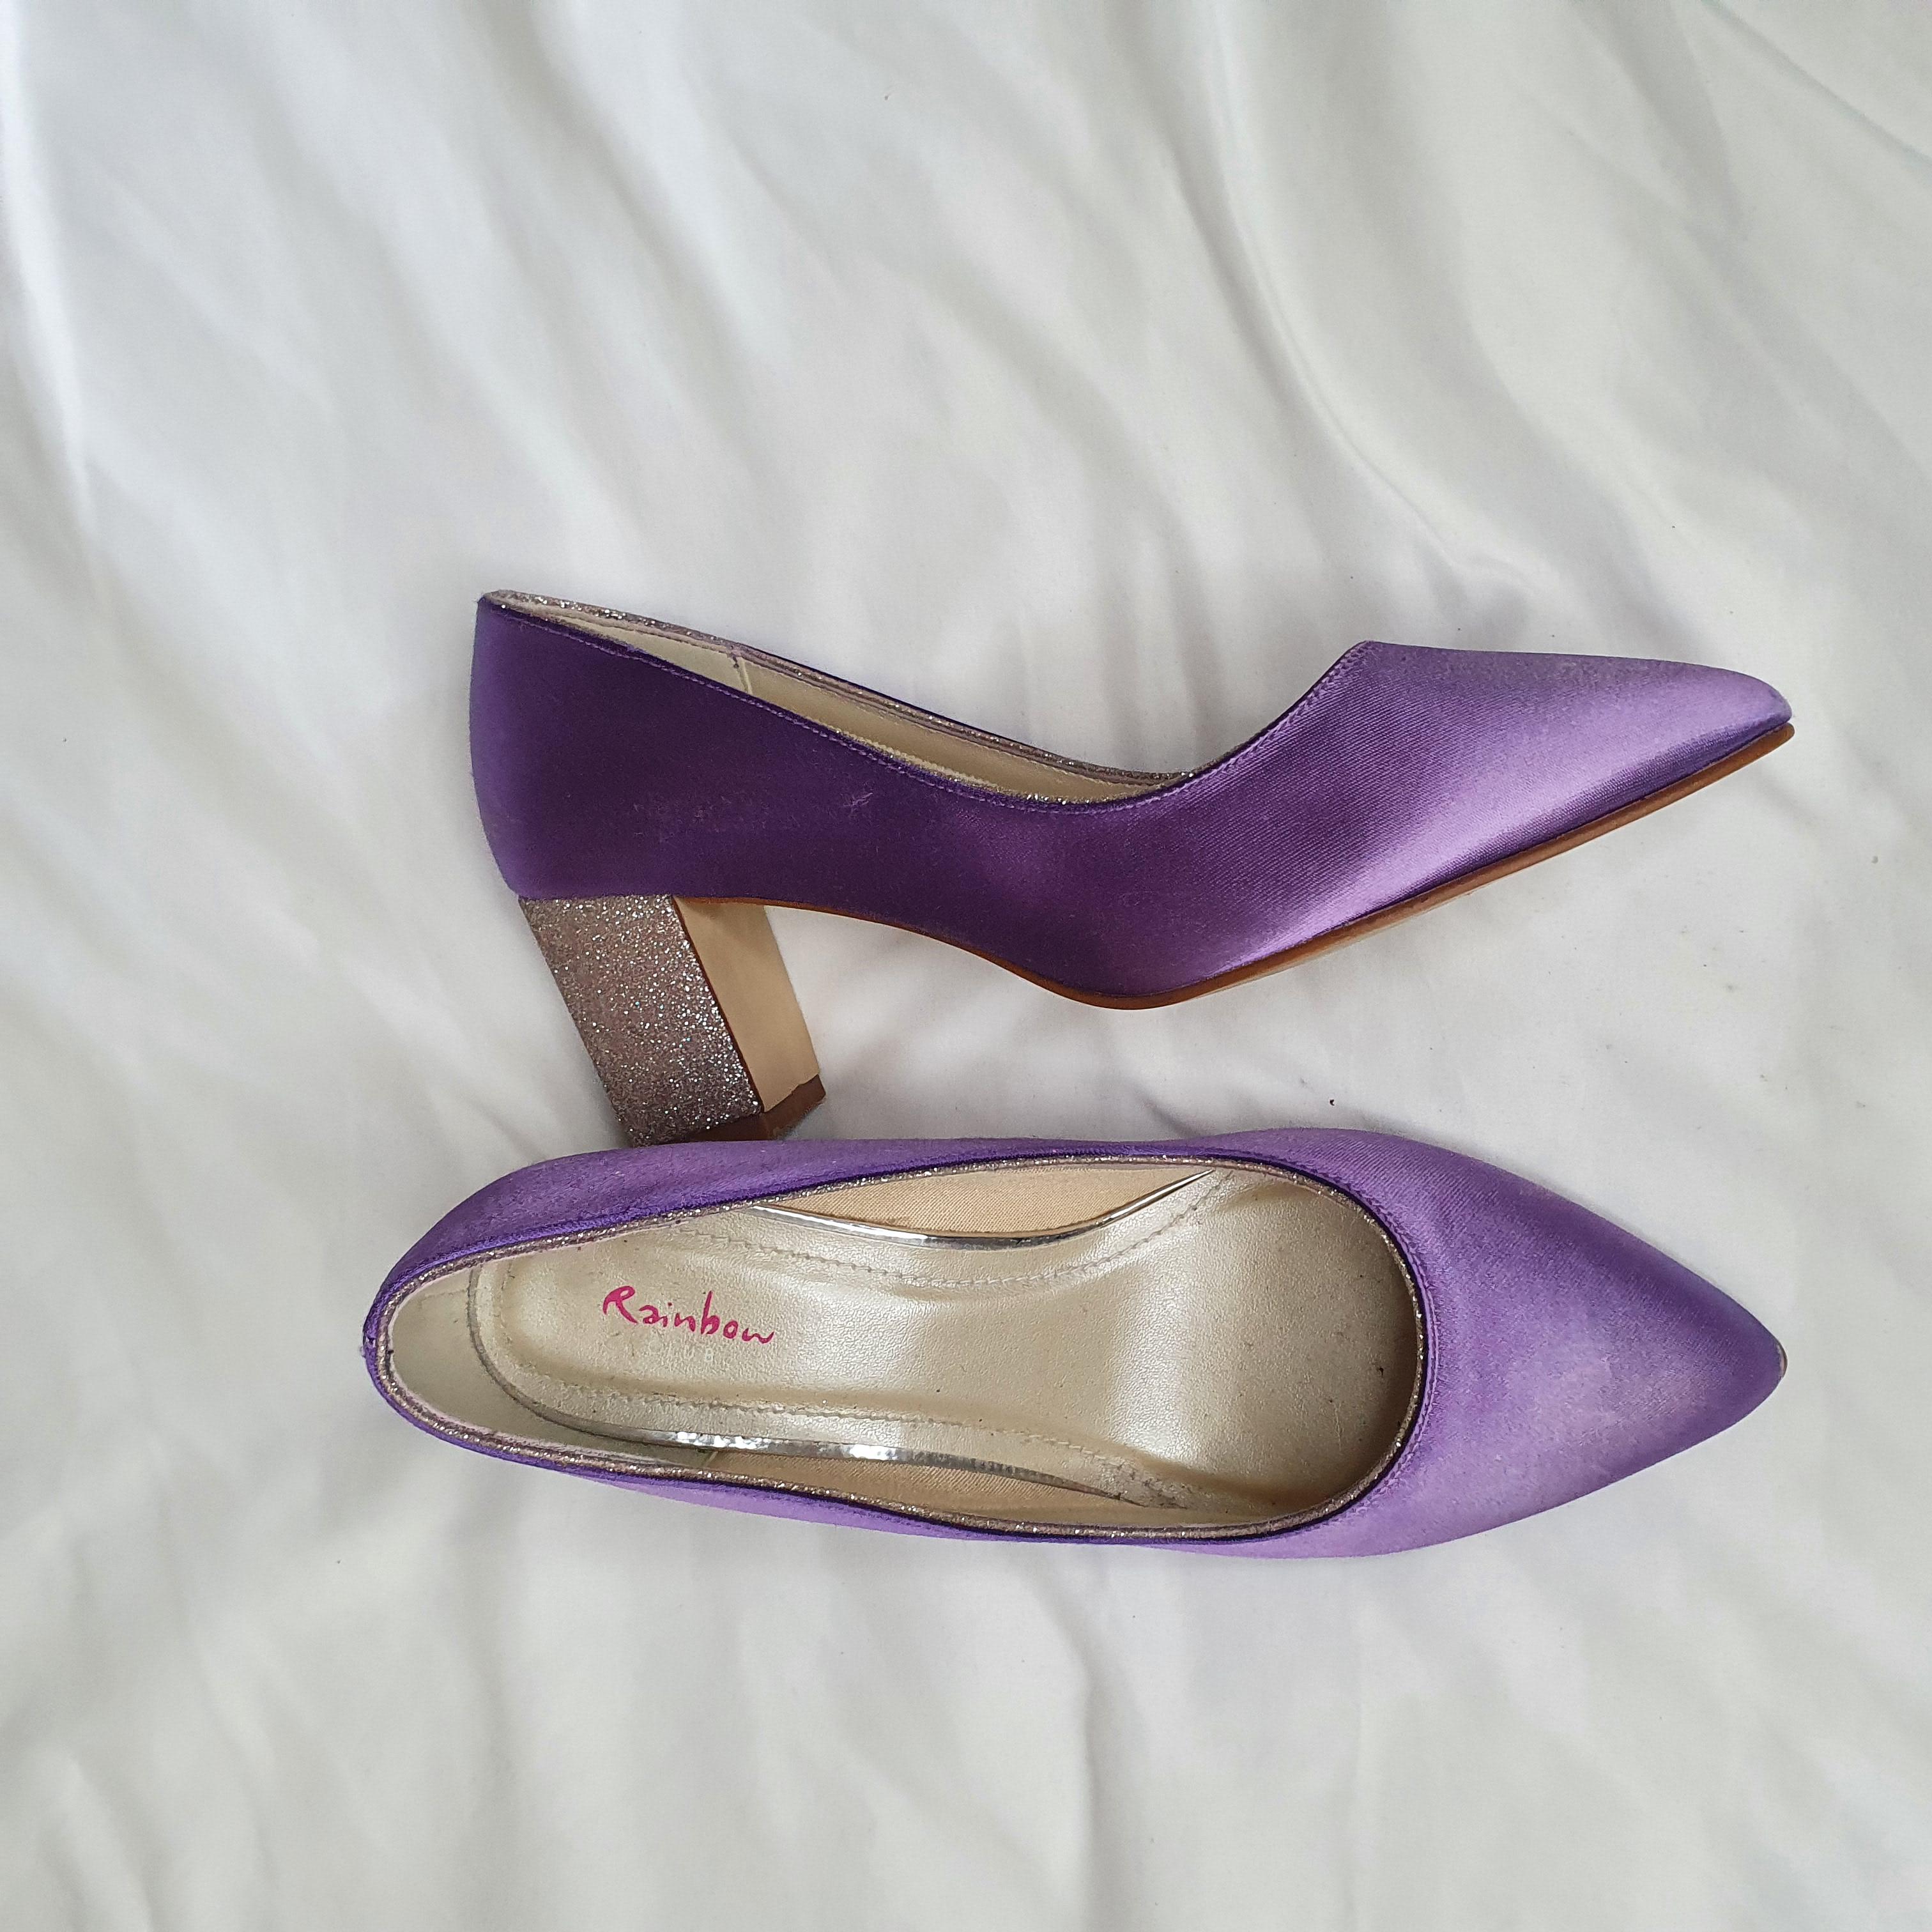 Image of Rainbow court heels